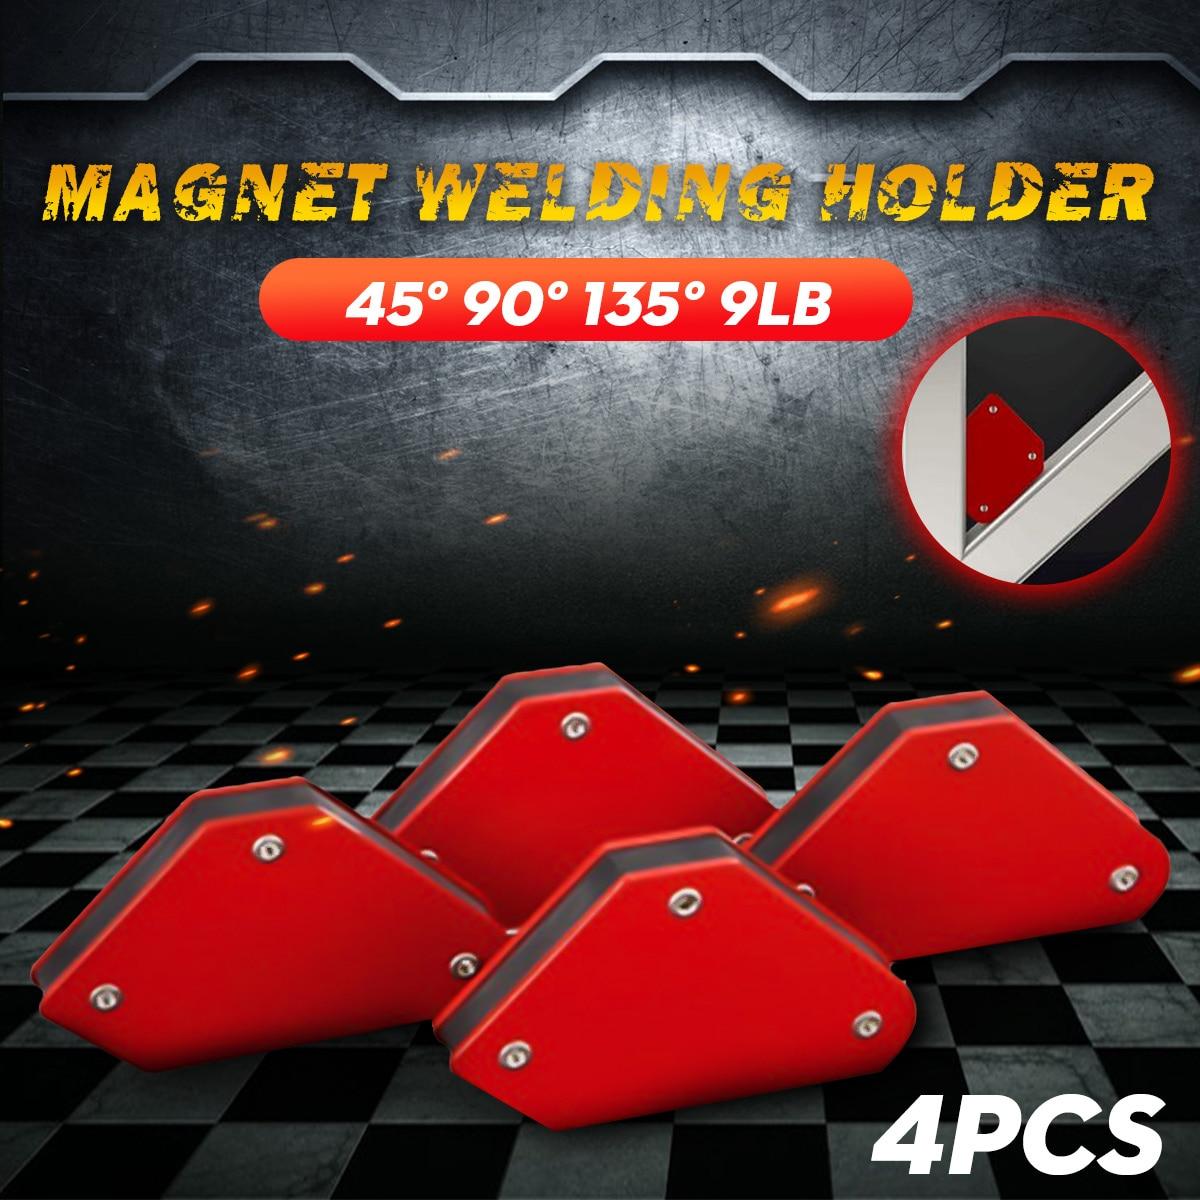 PCS Welding Magnet Magnetic Square Welder Holder Arrow 135° 90° Clamp 45° S0G7